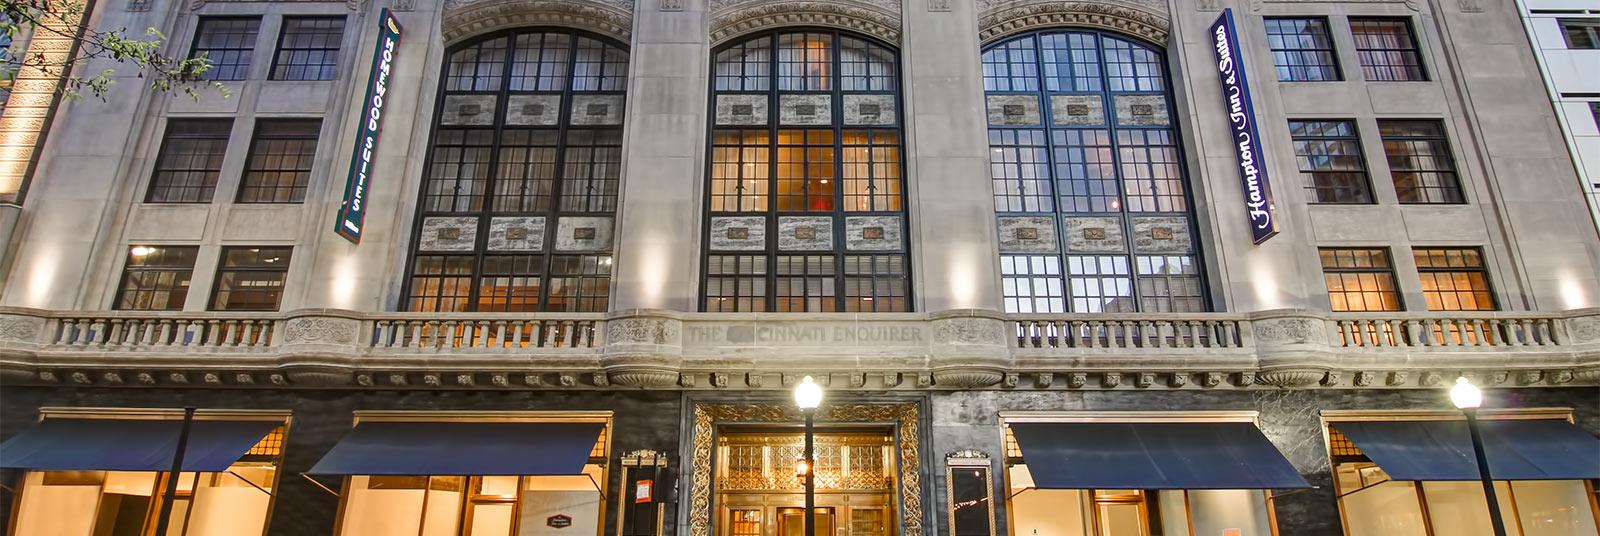 The Homewood Suites and Hampton Inn hotels at the Cincinnati Enquirer building in downtown Cincinnati, Ohio.